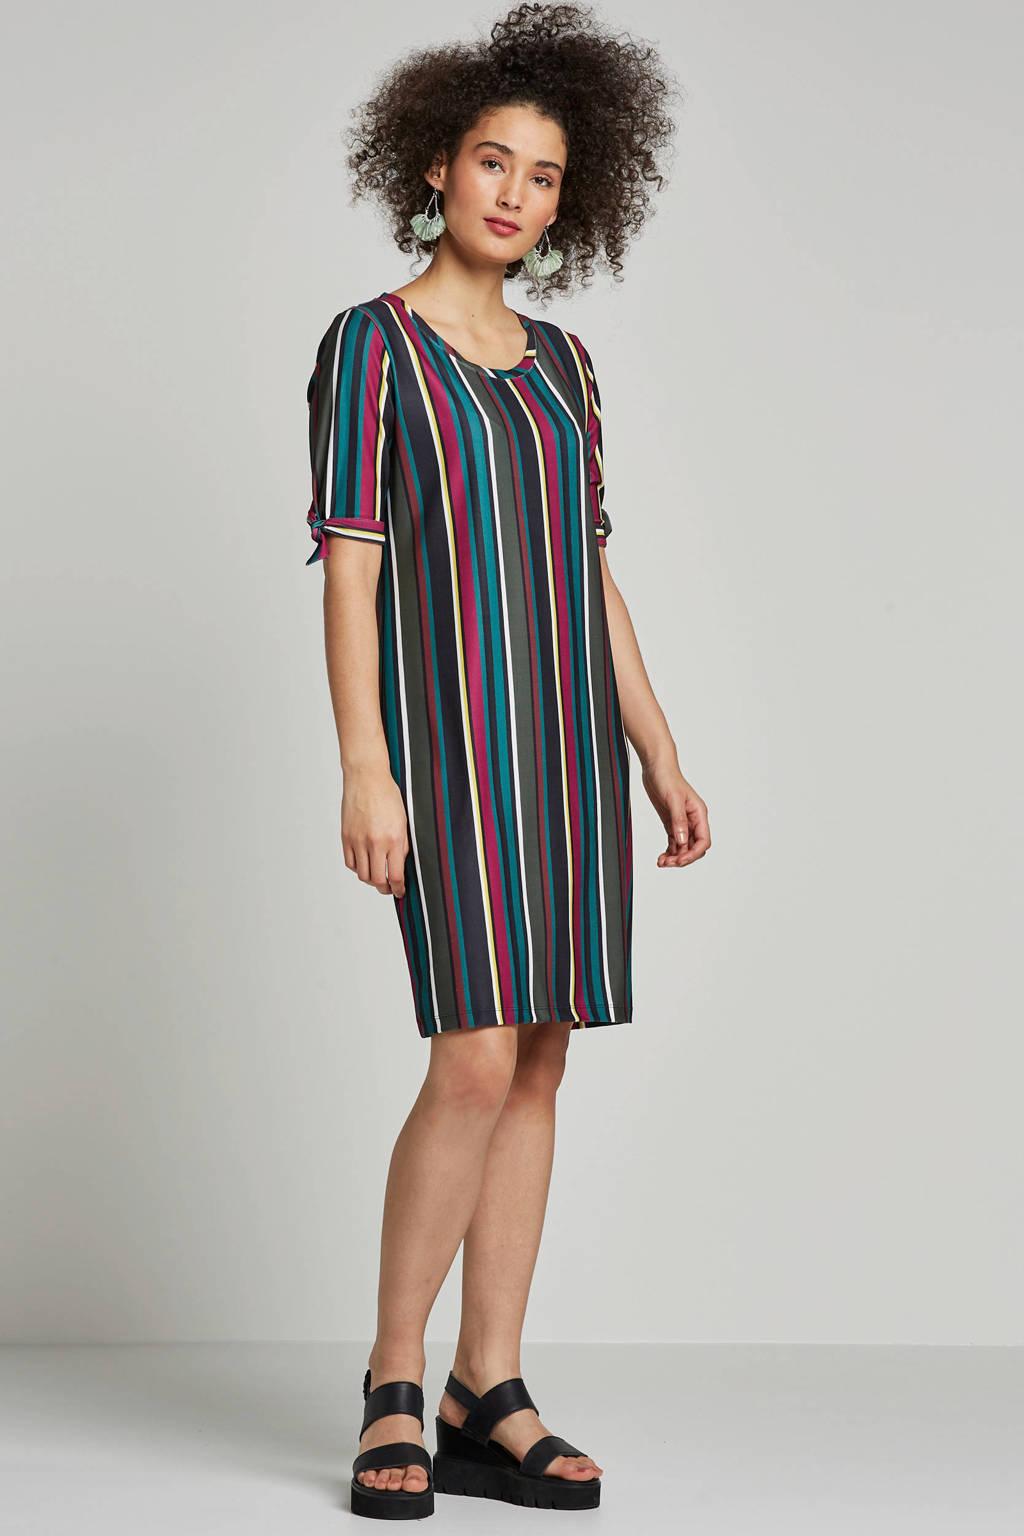 whkmp's beachwave jurk met streepprint, Groen/zwart/roze